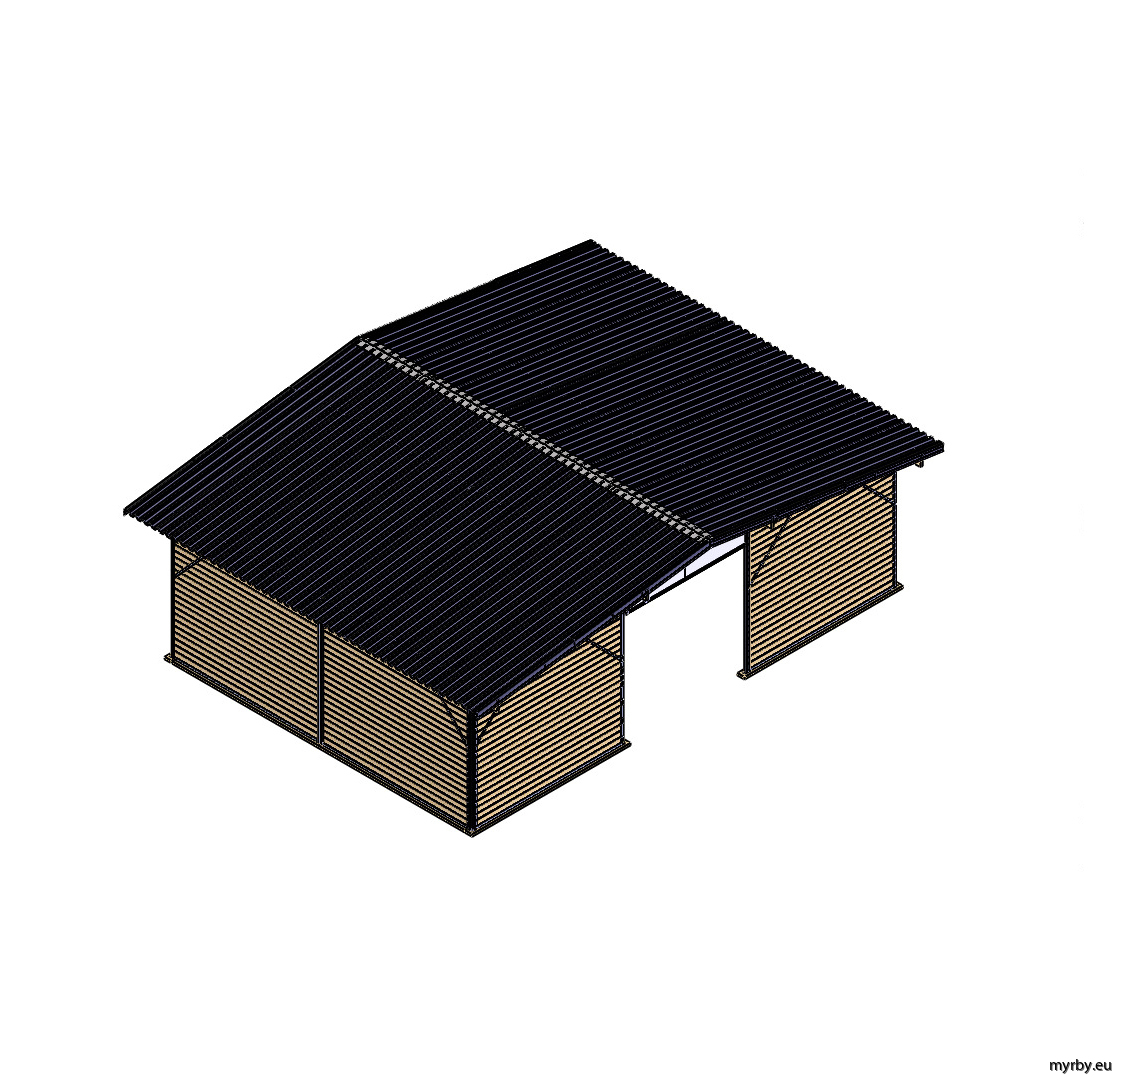 14207-17 Ligghall 52 m²